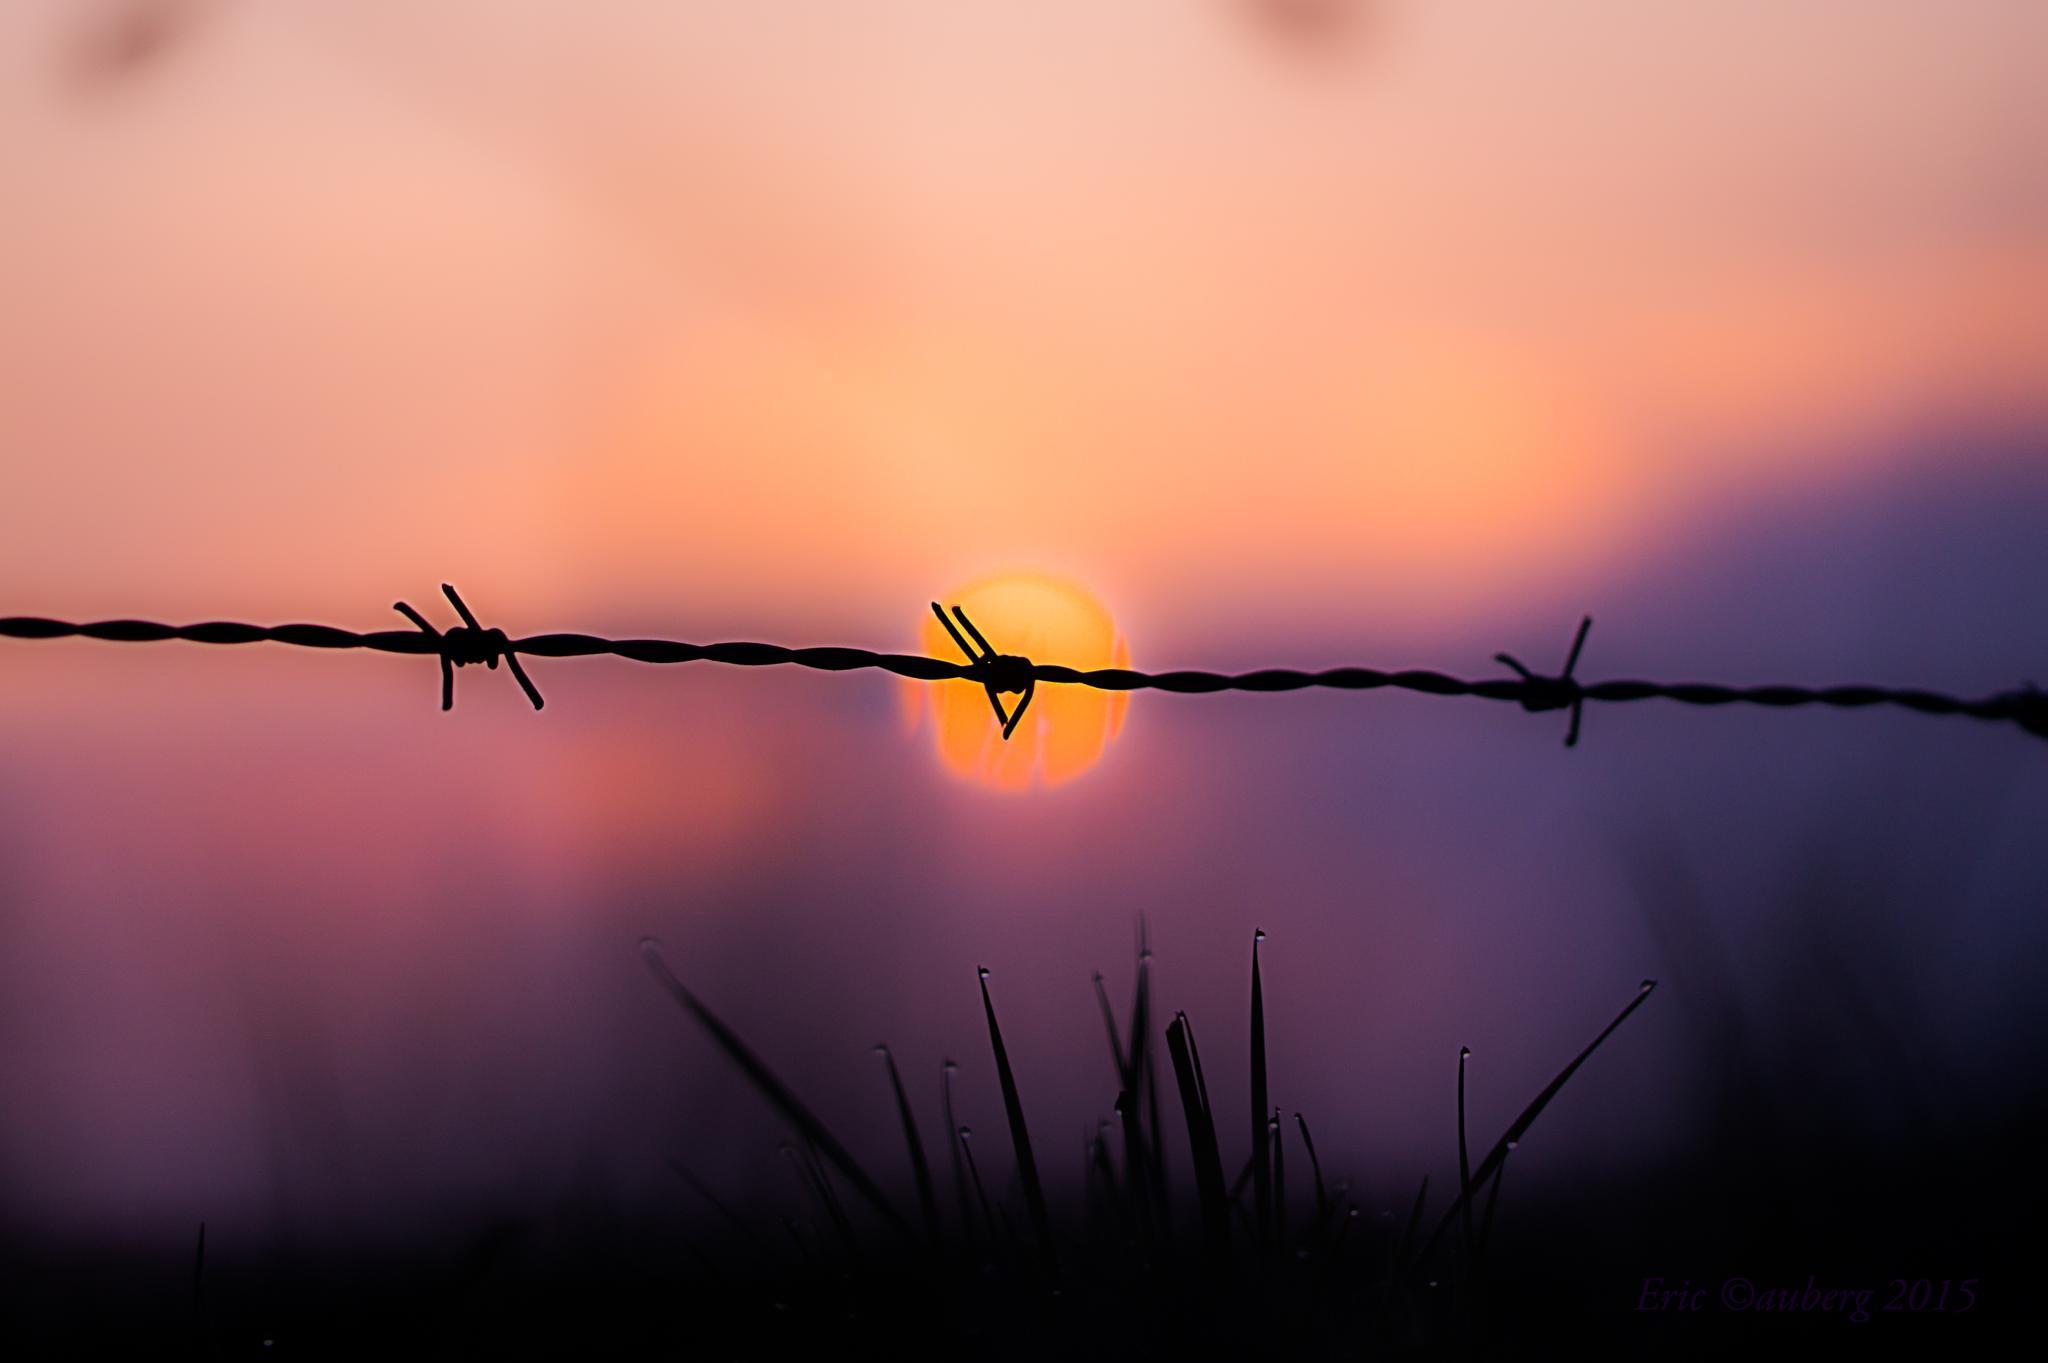 Barb wire the sun by ericau